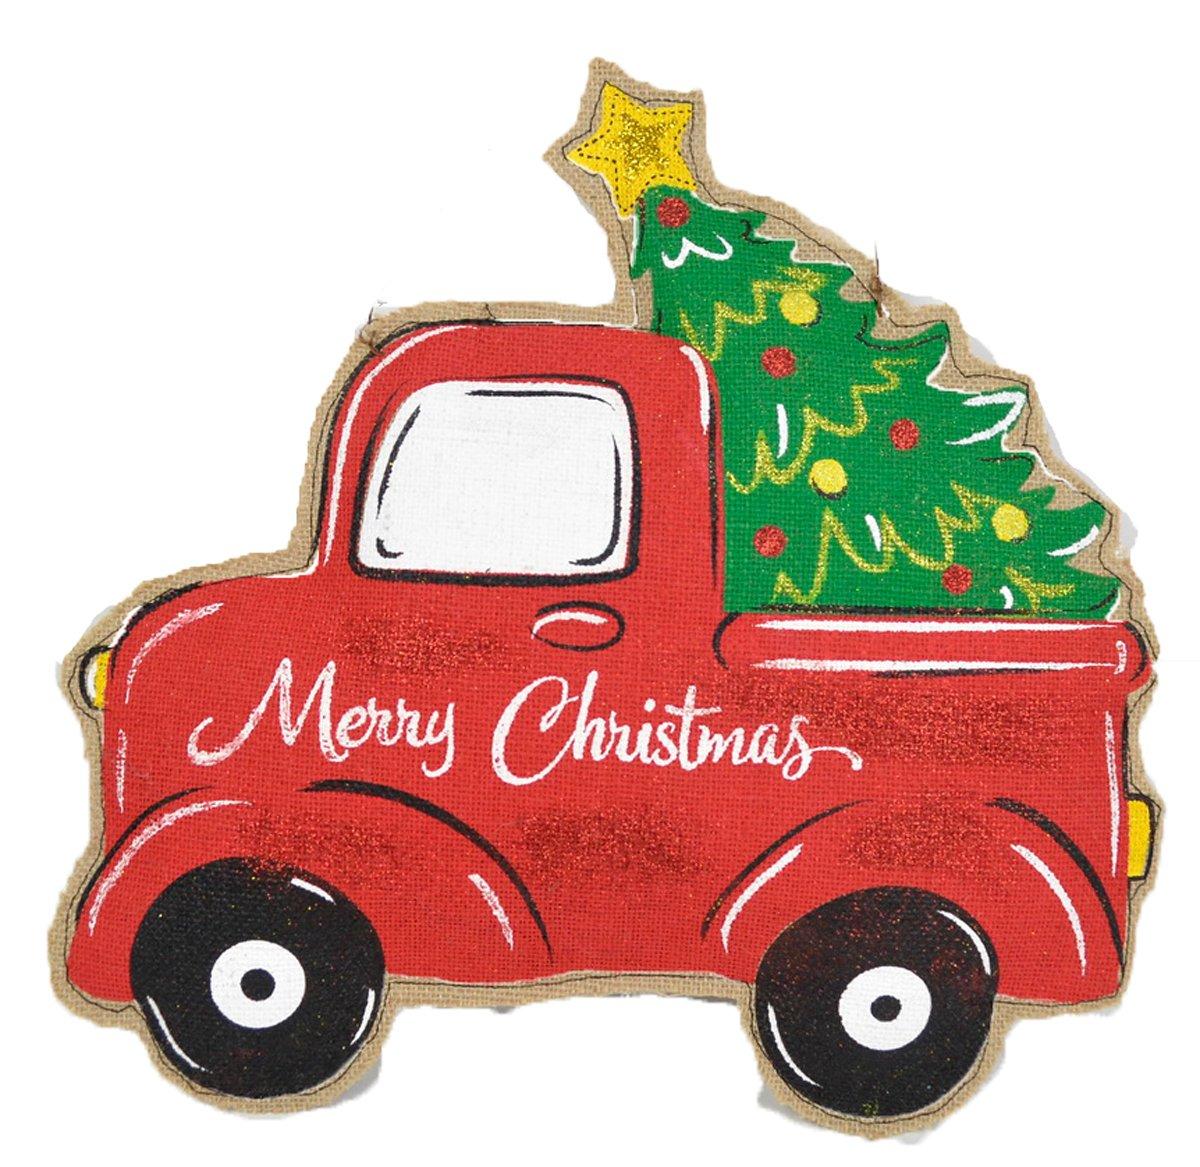 Vintage Truck Hauling Christmas Tree Door Hanger Holiday Door Decorations - Or Holiday Season Wall Hanging - Large 18 x 11 Size - On Burlap